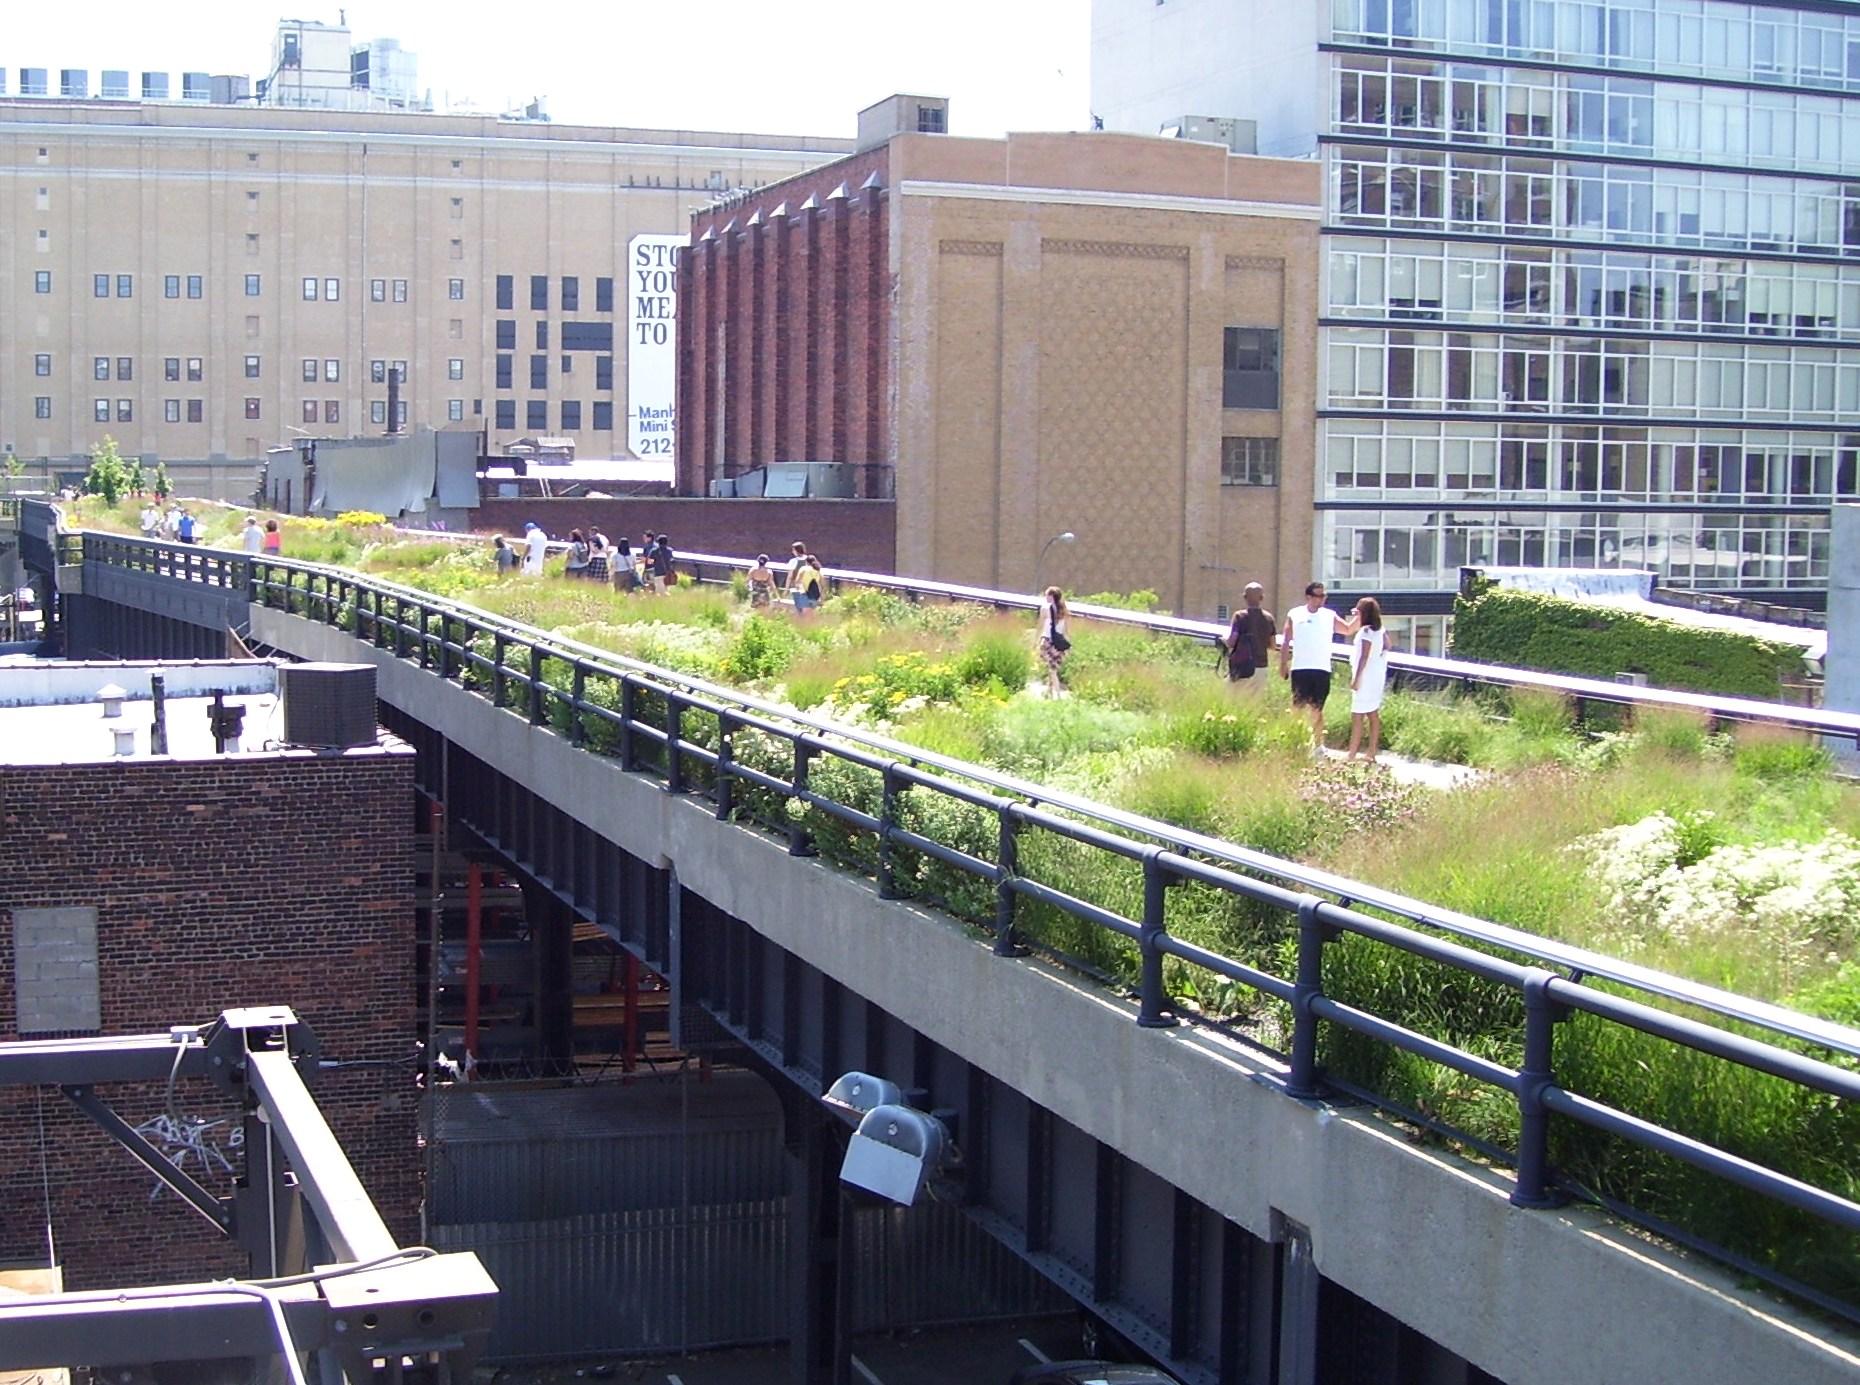 High_Line_20th_Street_looking_downtown.jpg